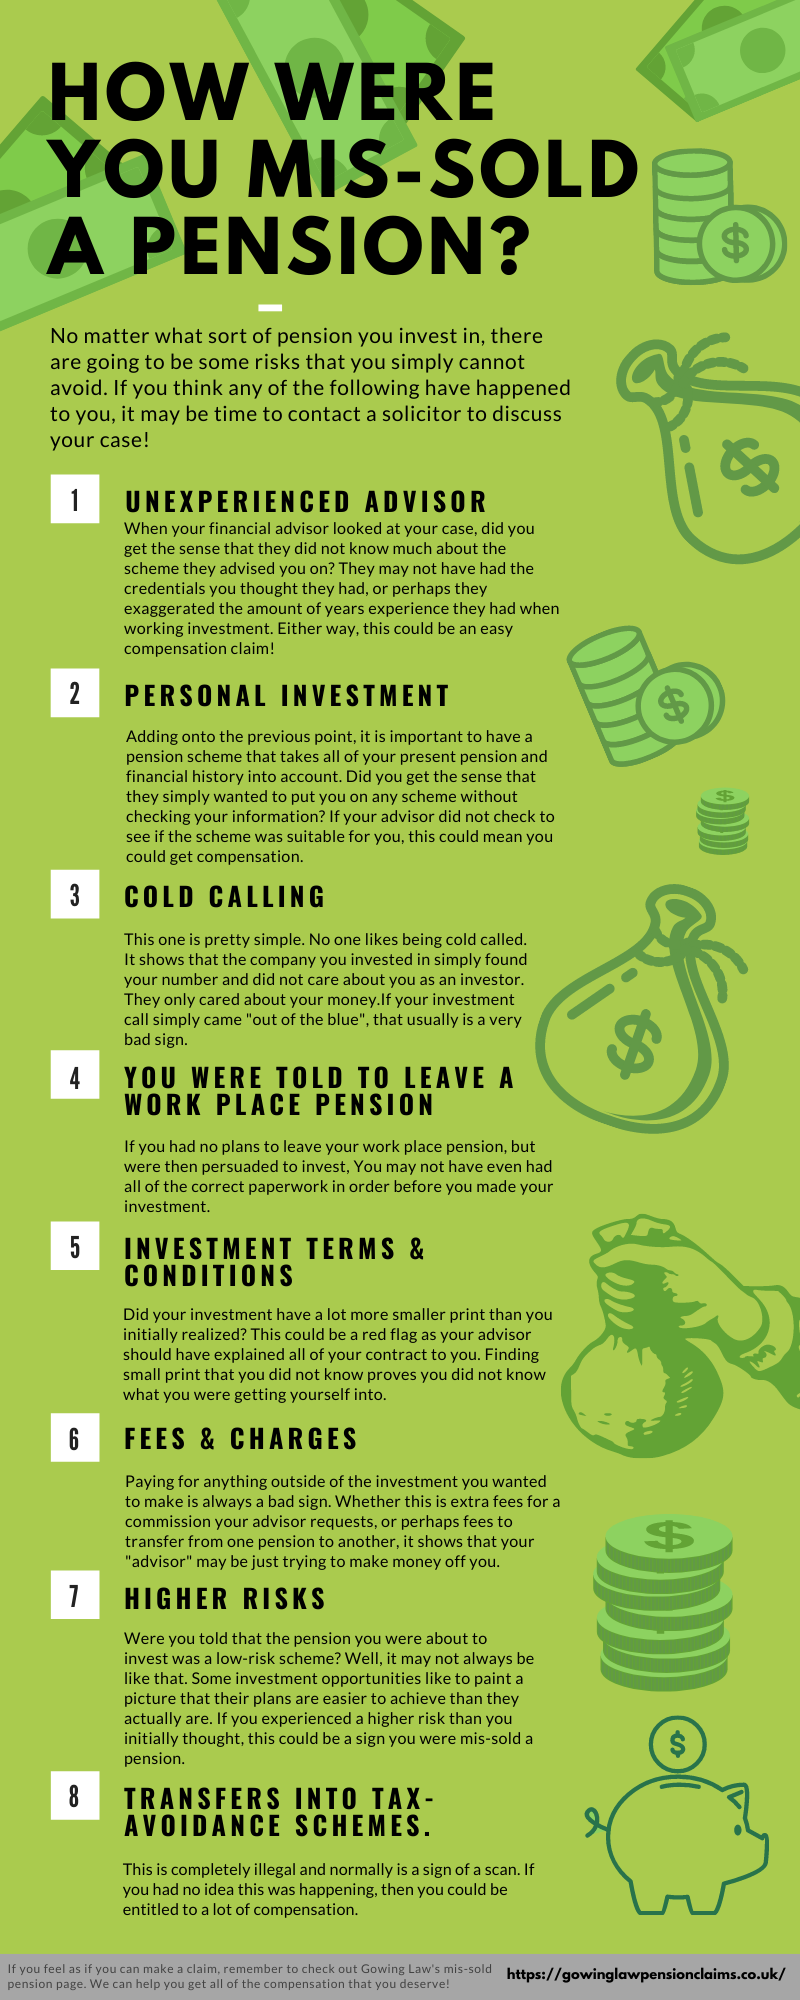 Mis-Sold Pension Scheme Infographic